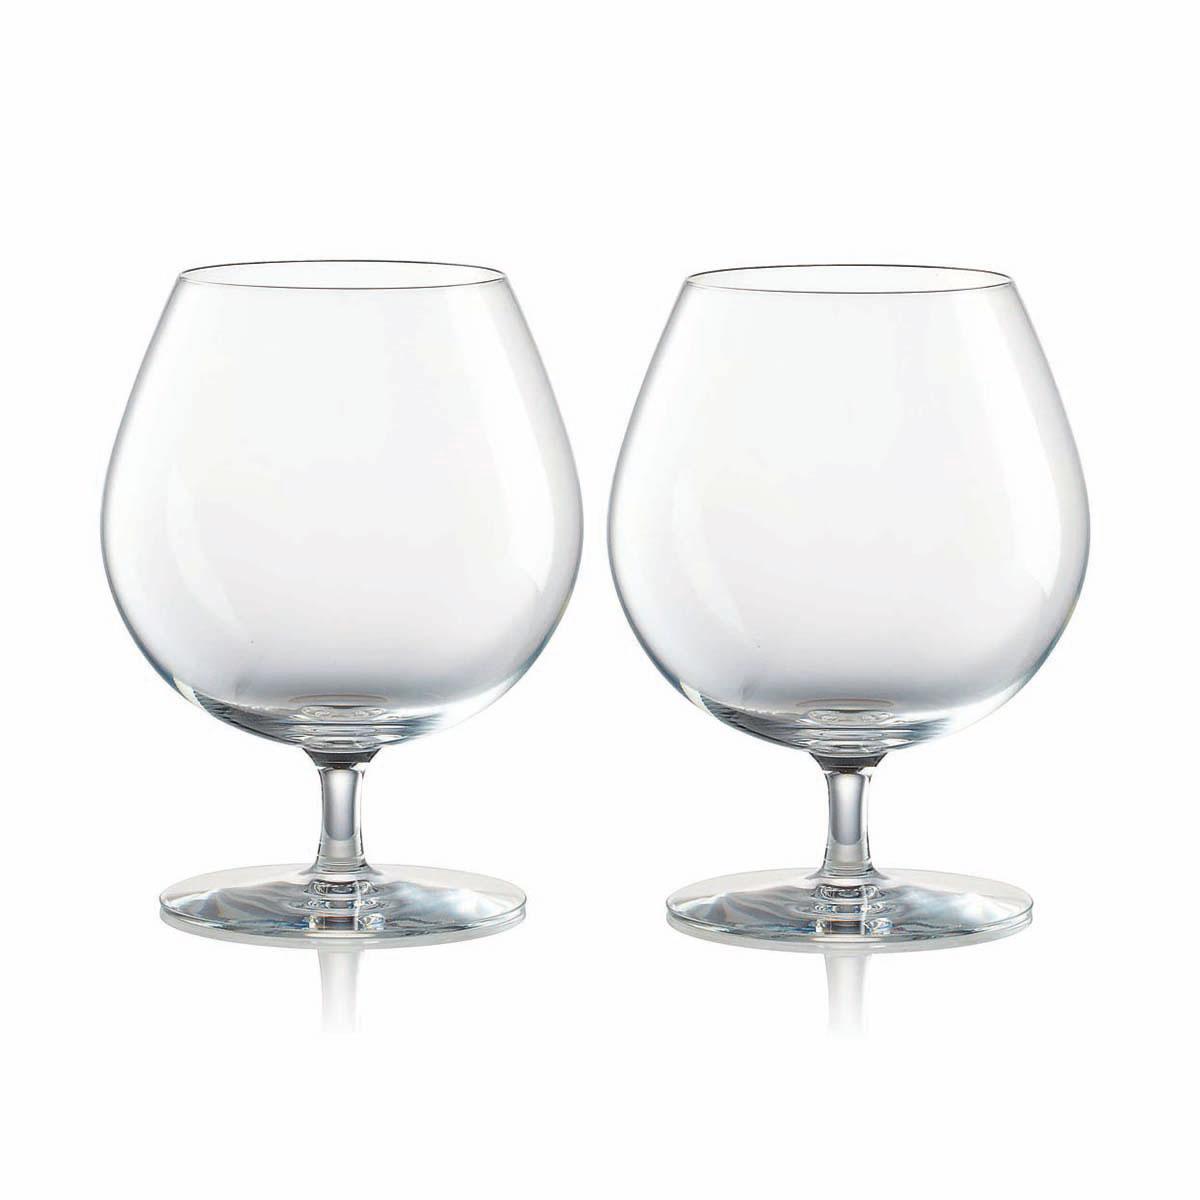 Rogaska Crystal, Expert Cognac, Pair